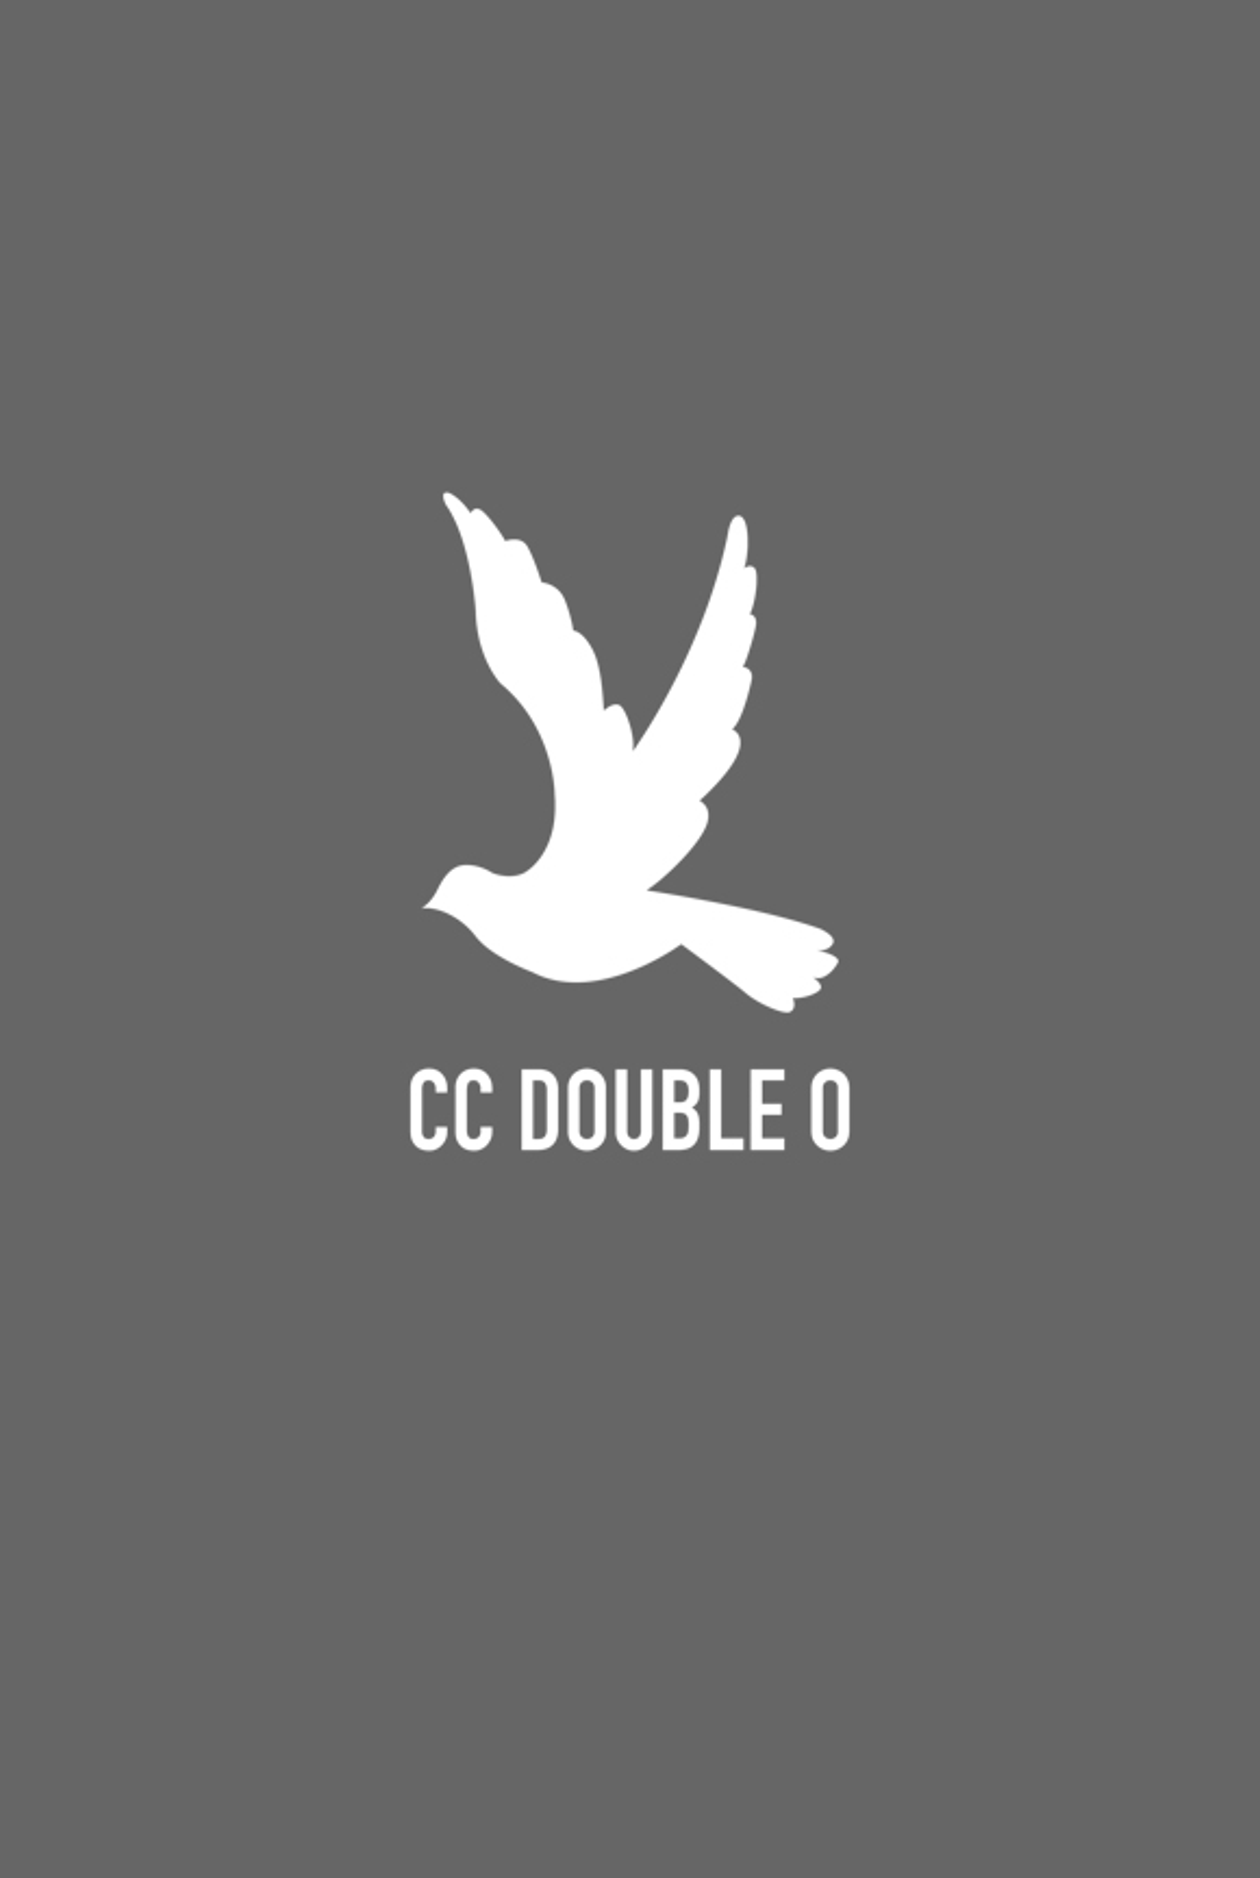 Long-Sleeved Bird Logo Shirt with CC DOUBLE O Sleeve Detail